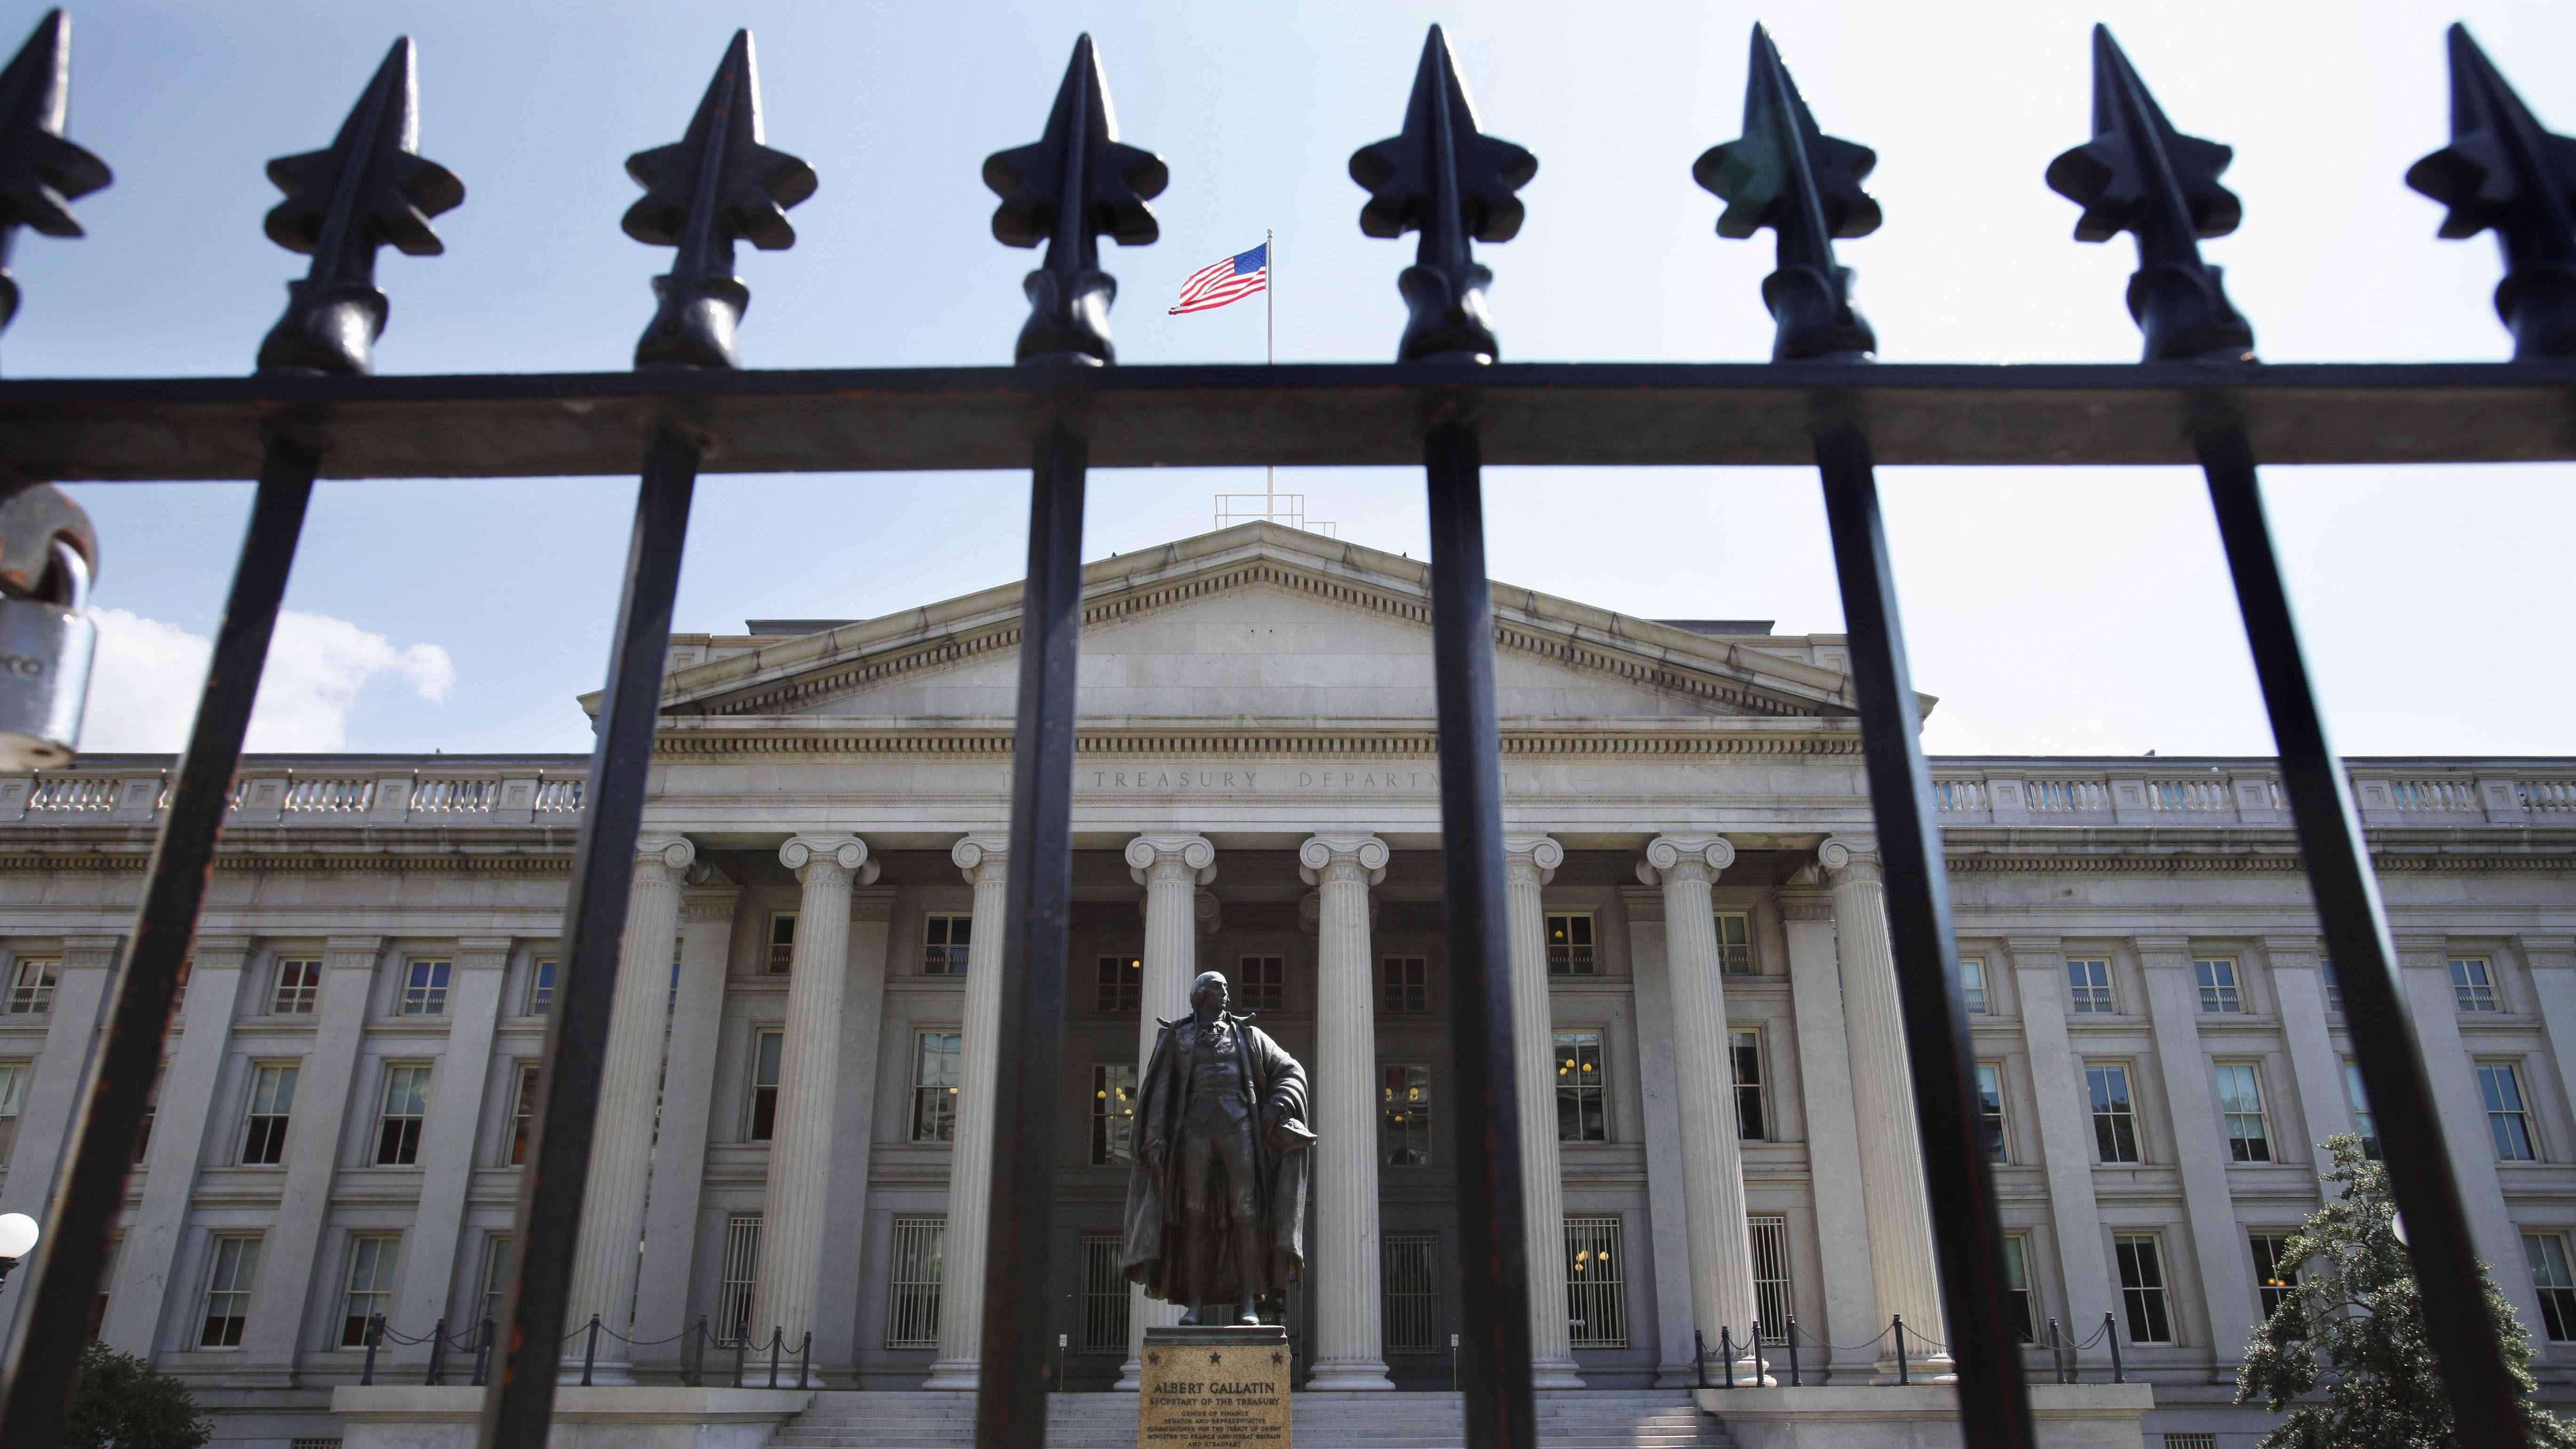 A statue of former Treasury Secretary Albert Gallatin stands guard outside the Treasury Building in Washington. Trump